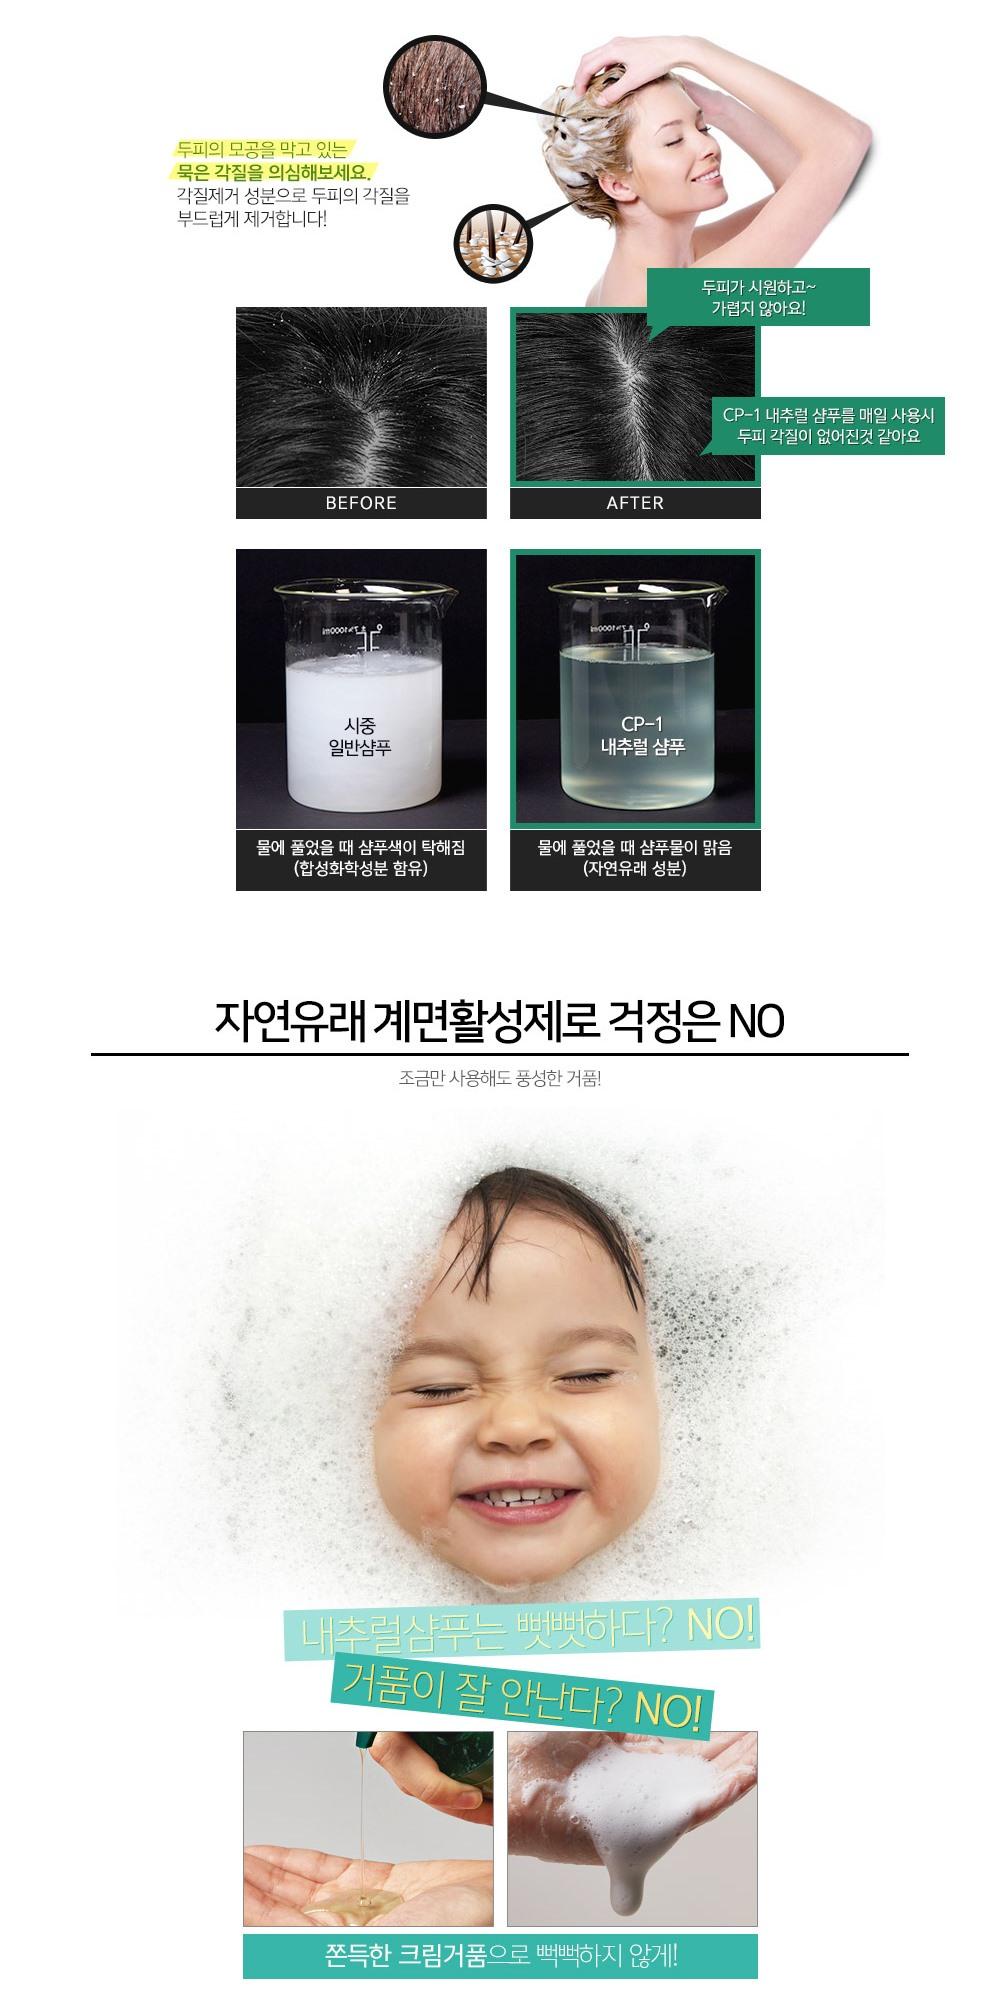 Натуральный увлажняющий шампунь для волос Esthetic House CP-1 Daily Moisture Natural Shampoo